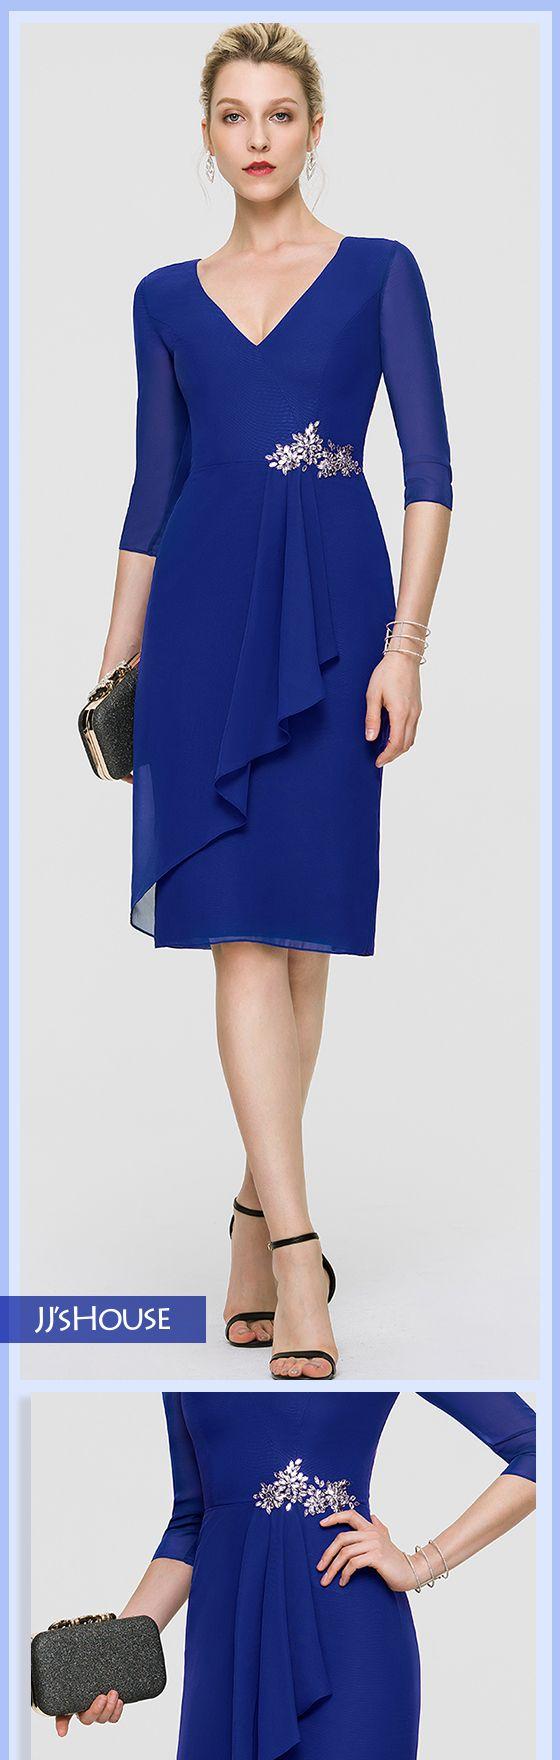 Sheath/Column V-neck Knee-Length Chiffon Cocktail Dress With Beading Sequins #JJ…